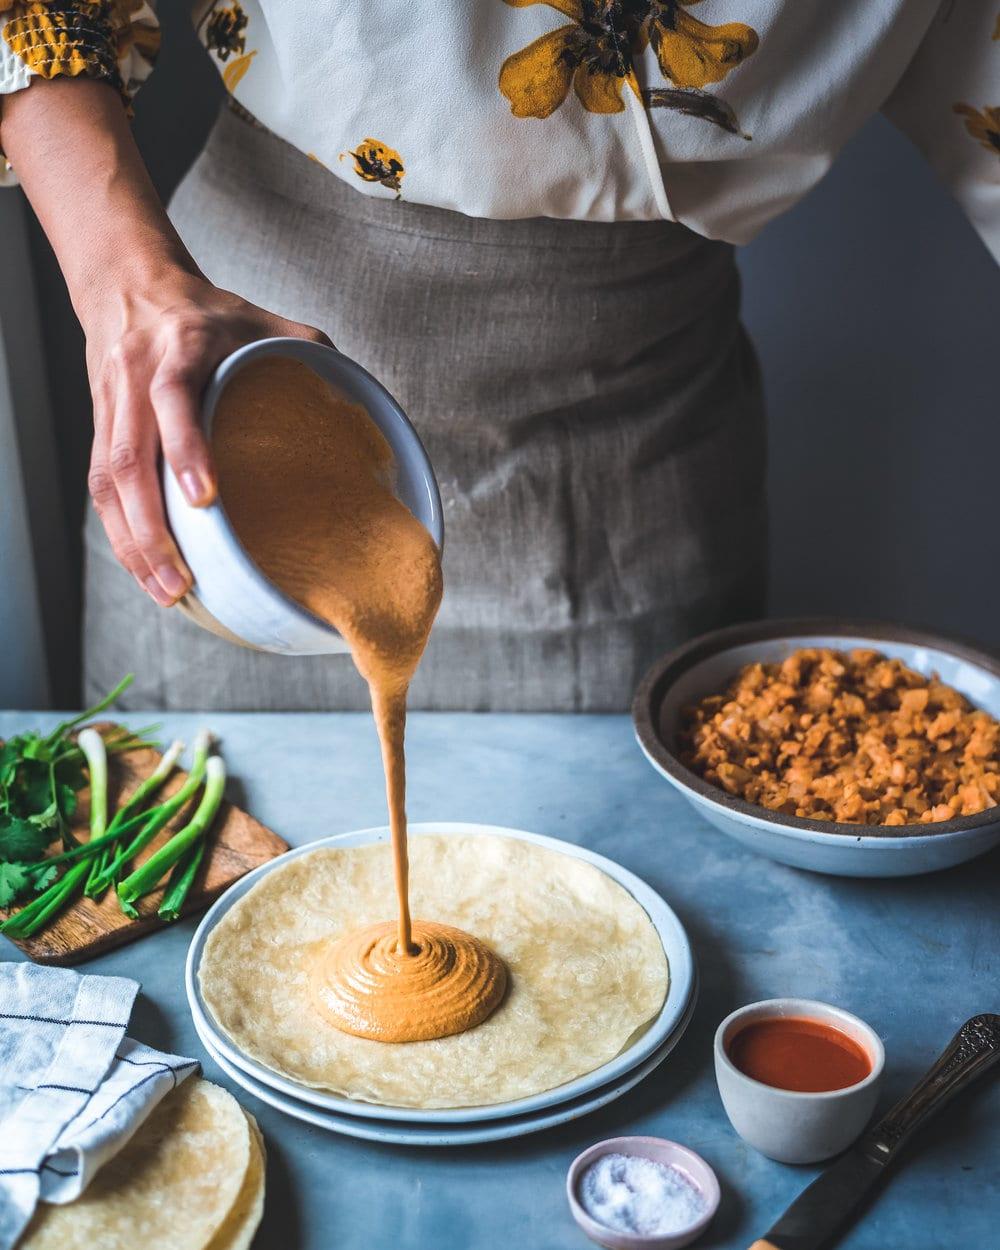 Woman pouring vegan buffalo cheese sauce onto quesadill